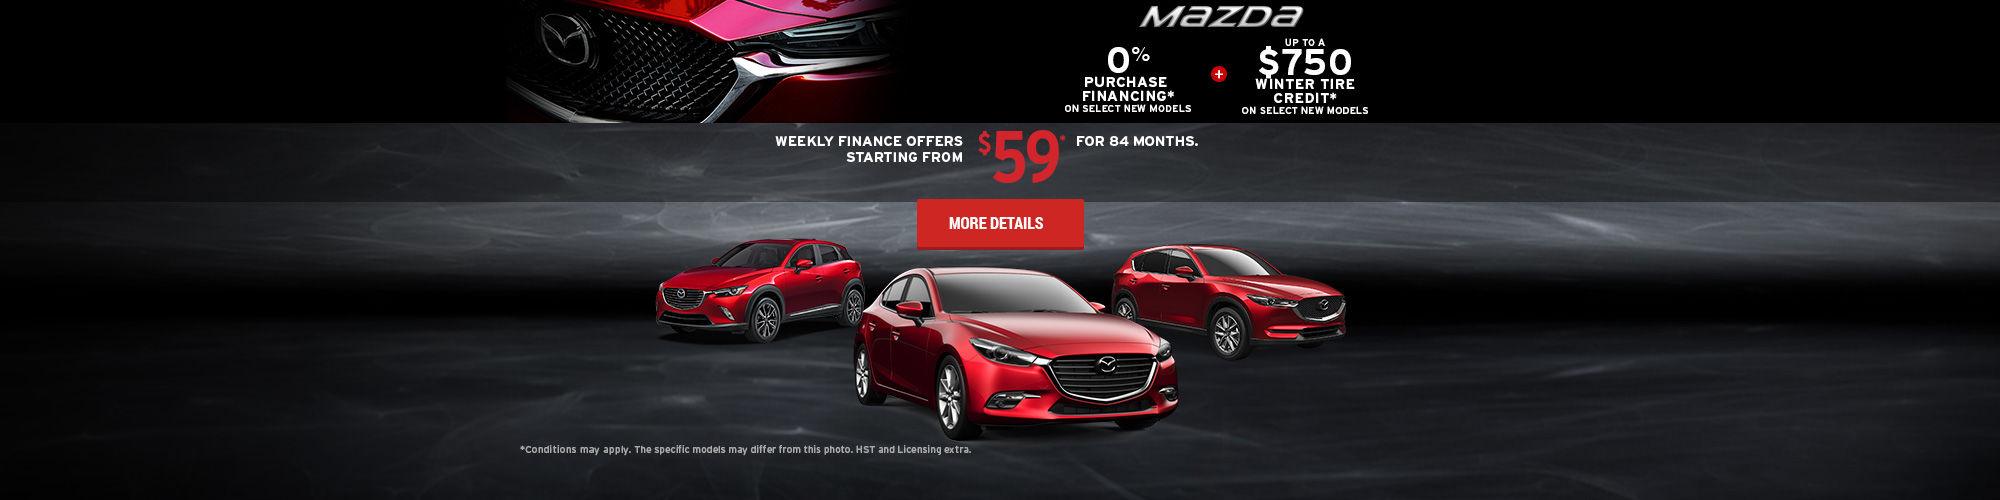 Mazda event!